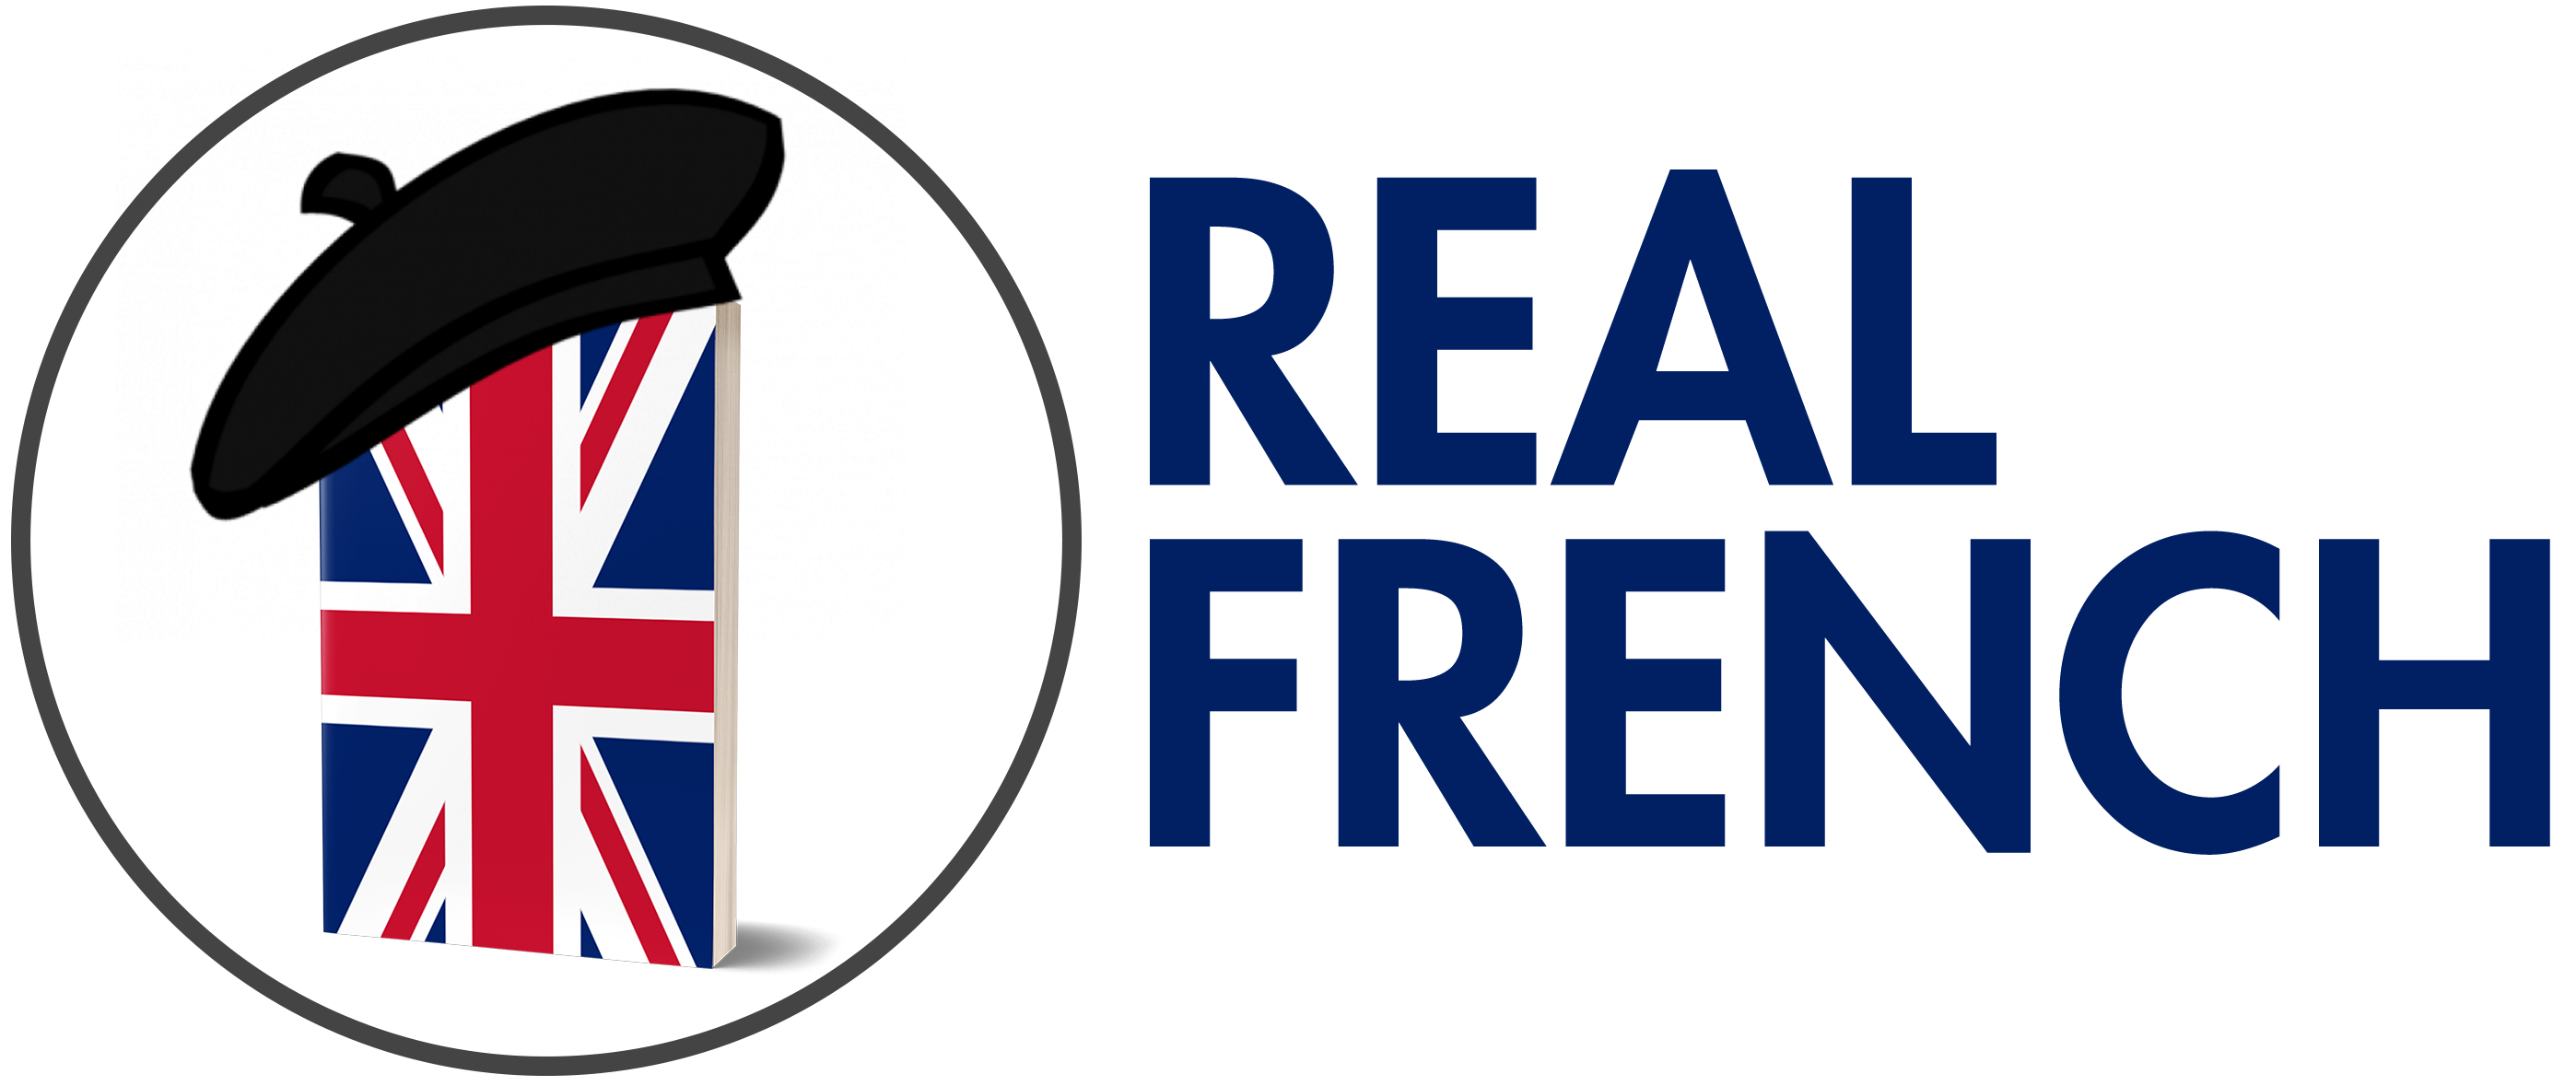 realfrench.net